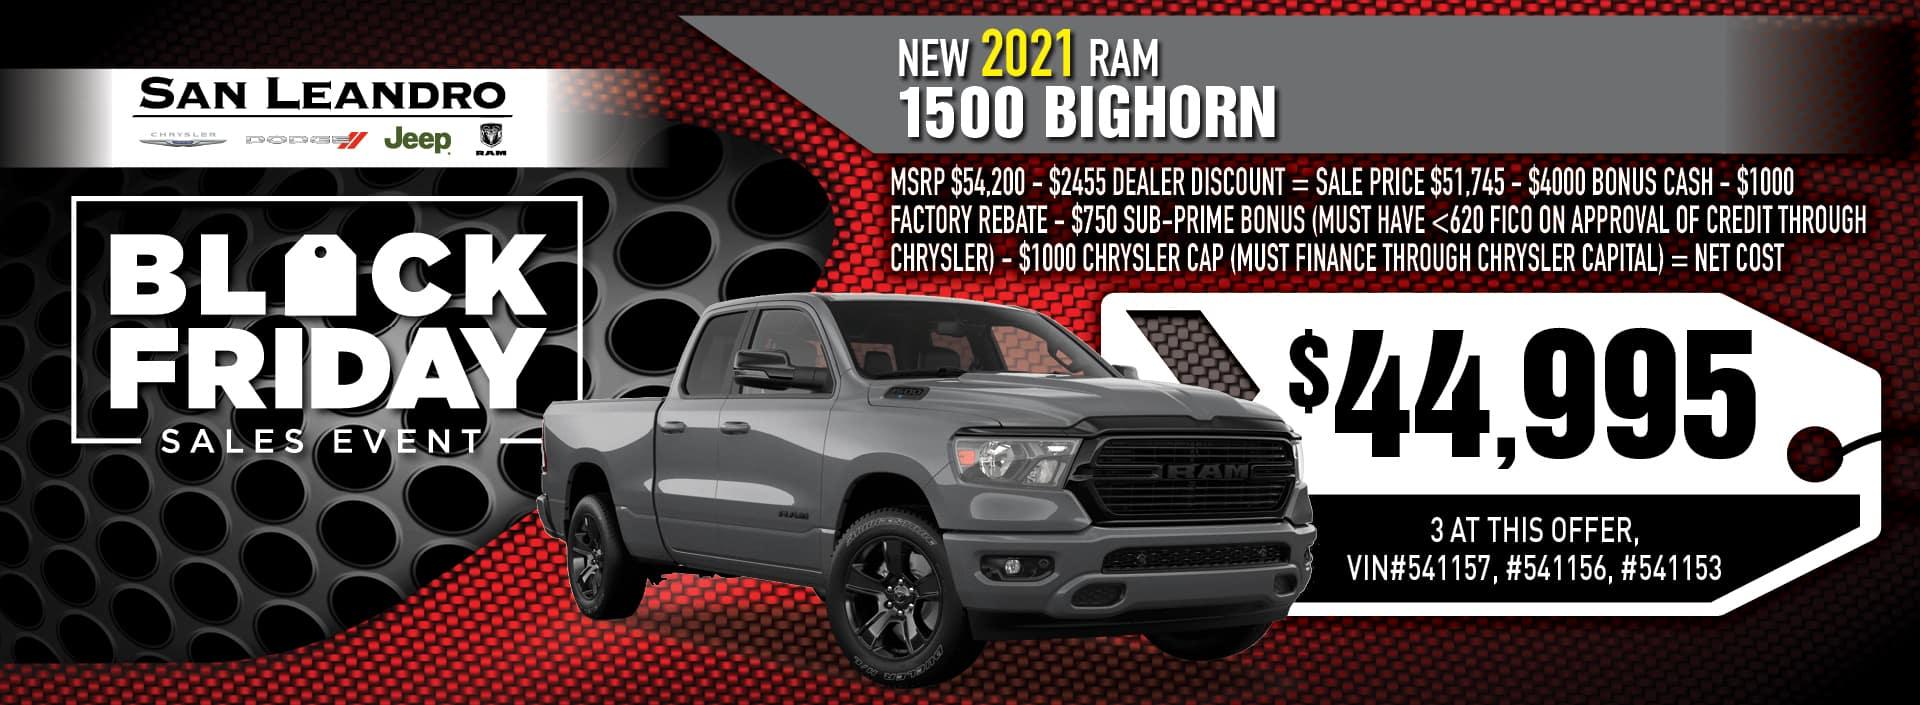 1500 Bighorn